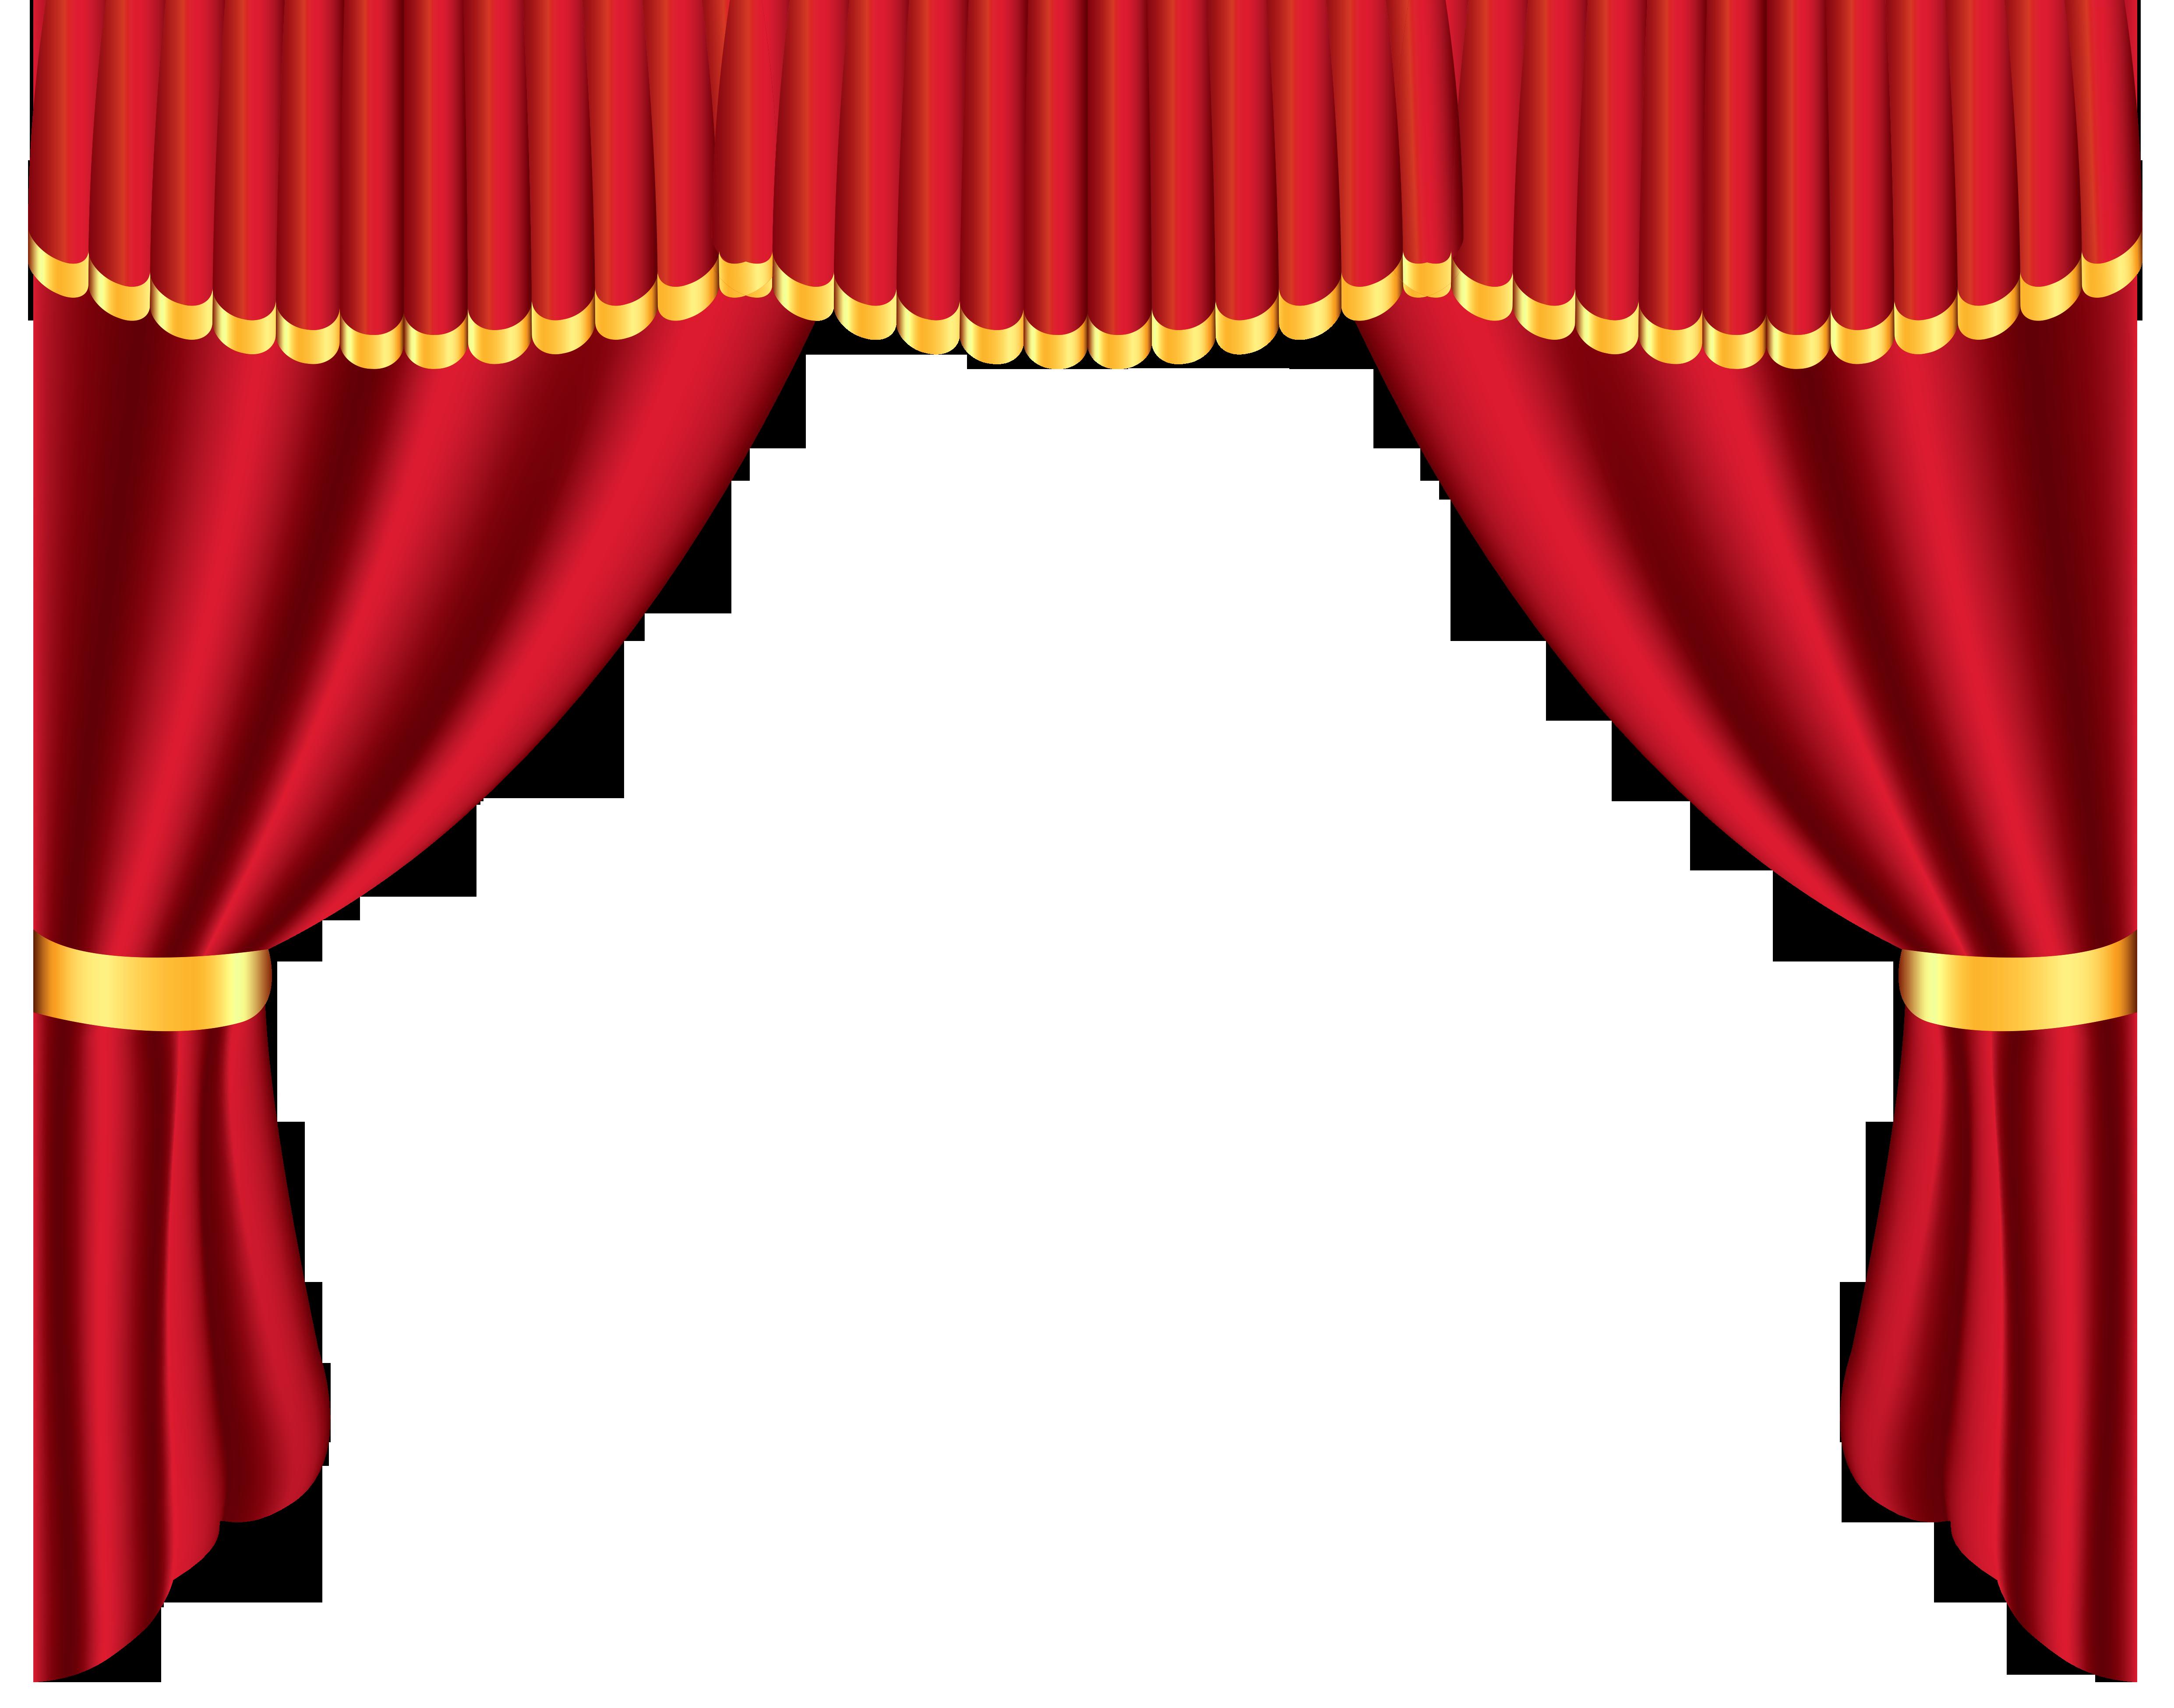 Curtain Clipart #1-Curtain Clipart #1-2